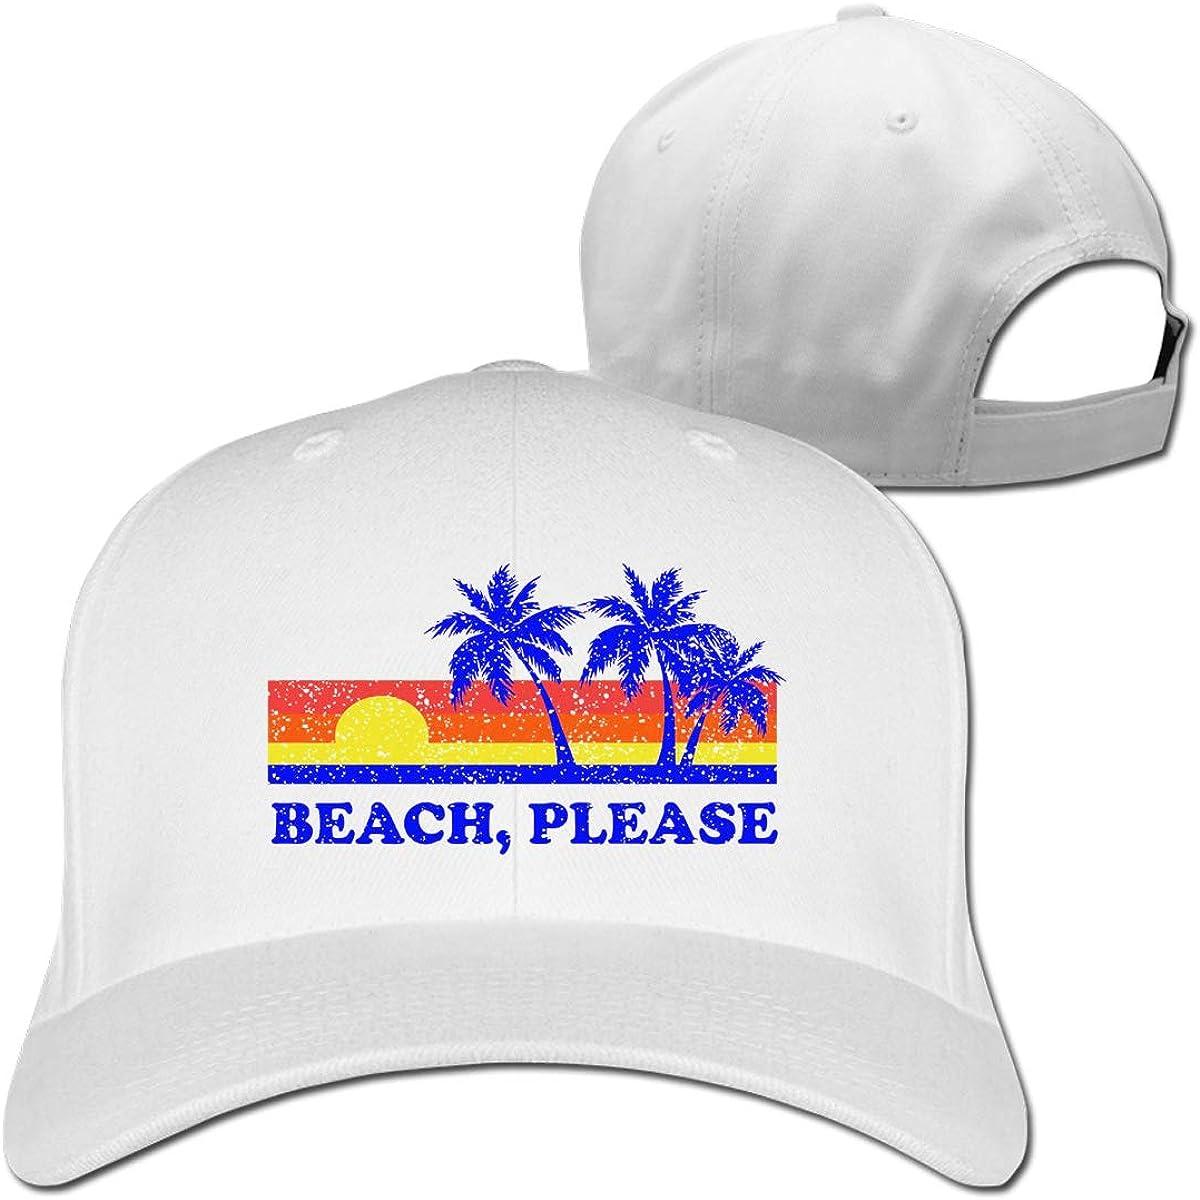 Beach Please 100/% Cotton Baseball Caps Adjustable Dad Trucker Sun Hat Outdoor Custom Cap for Men Women